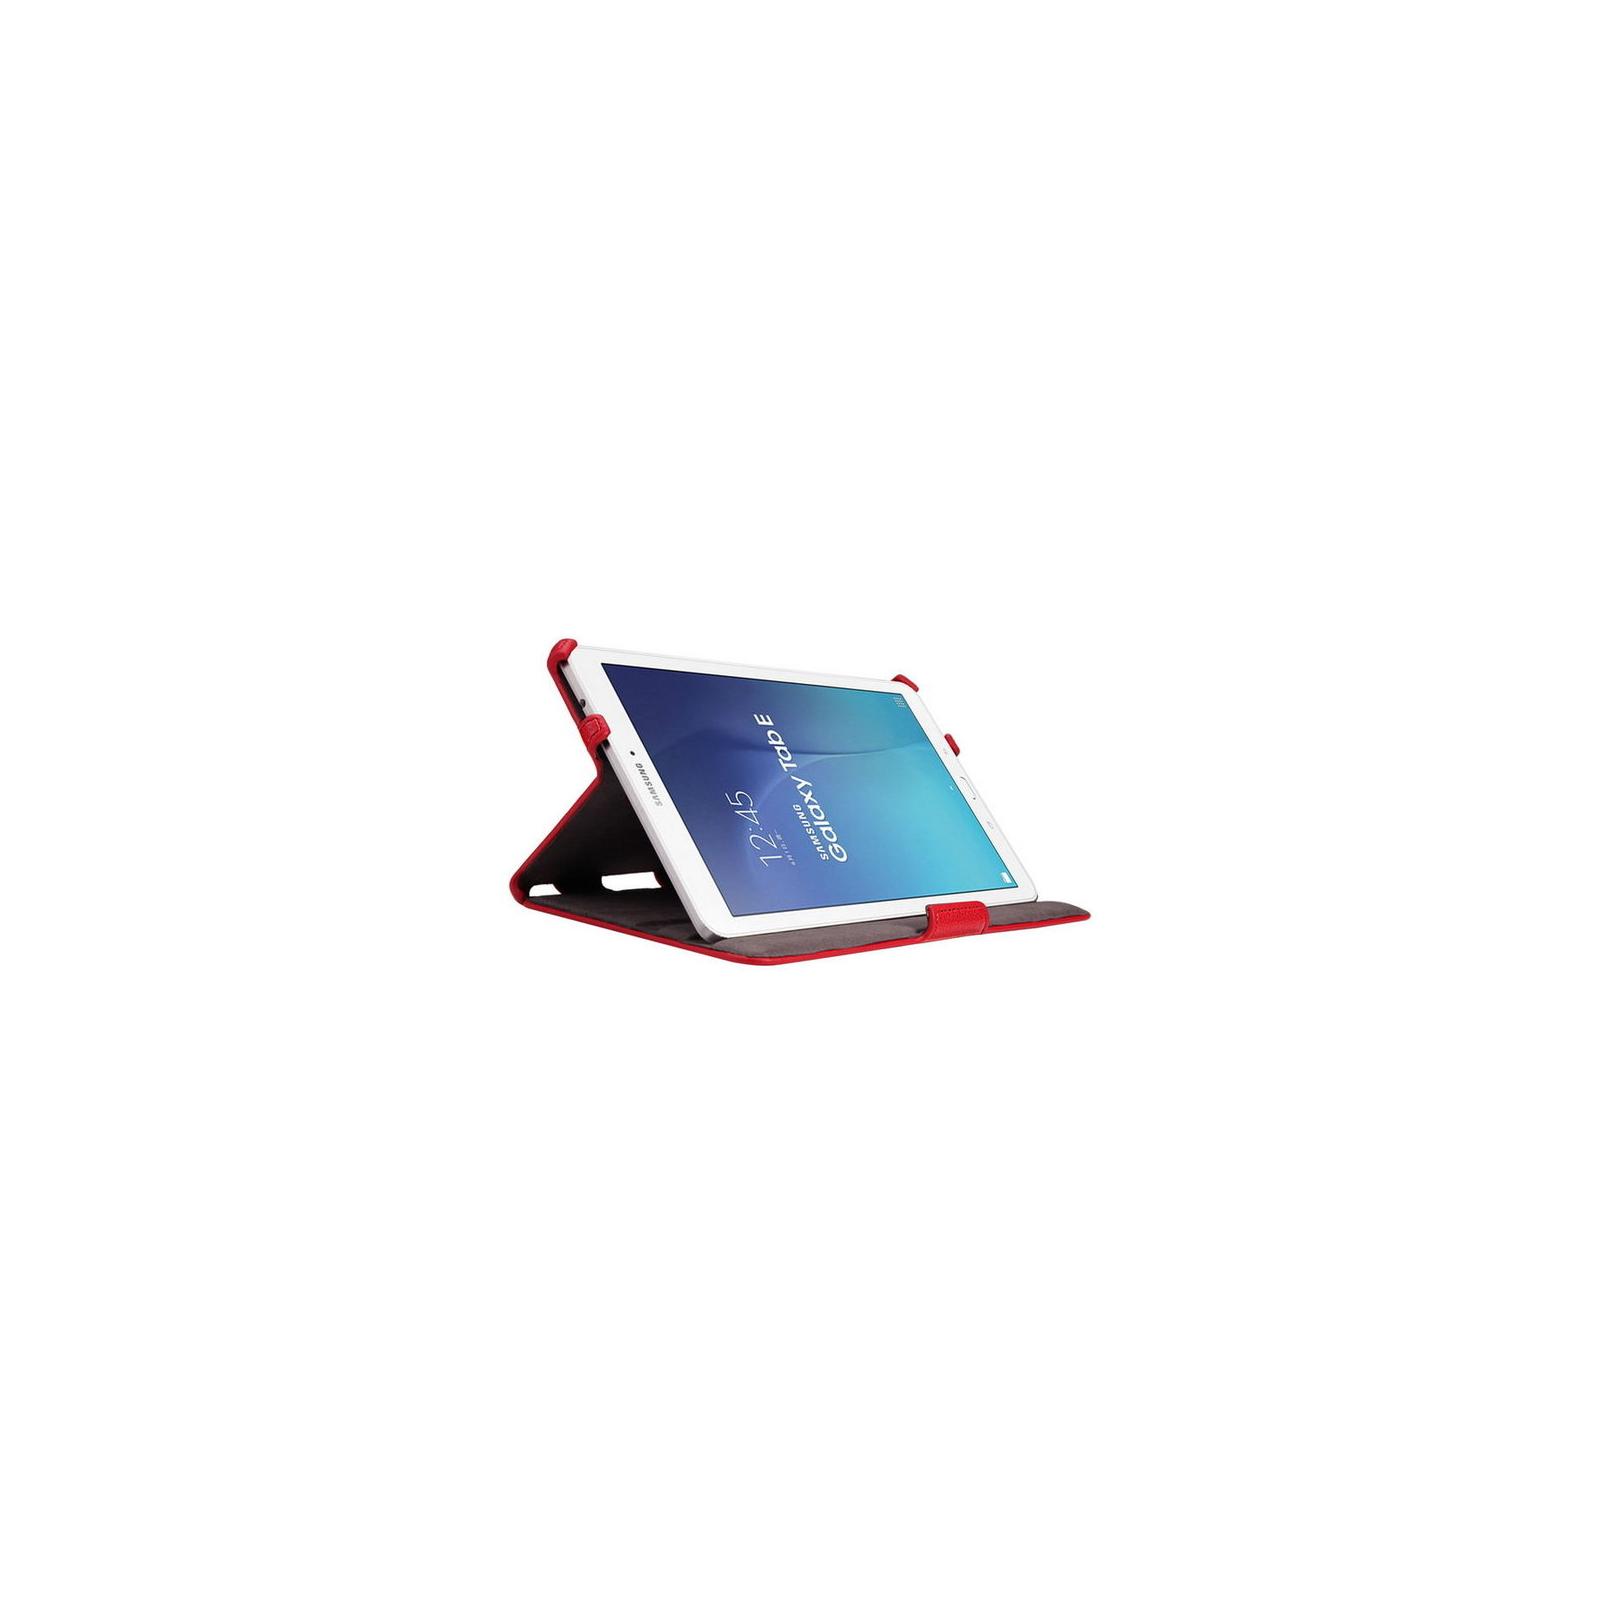 Чехол для планшета AirOn для Samsung Galaxy Tab E 9.6 red (4822352777258) изображение 6